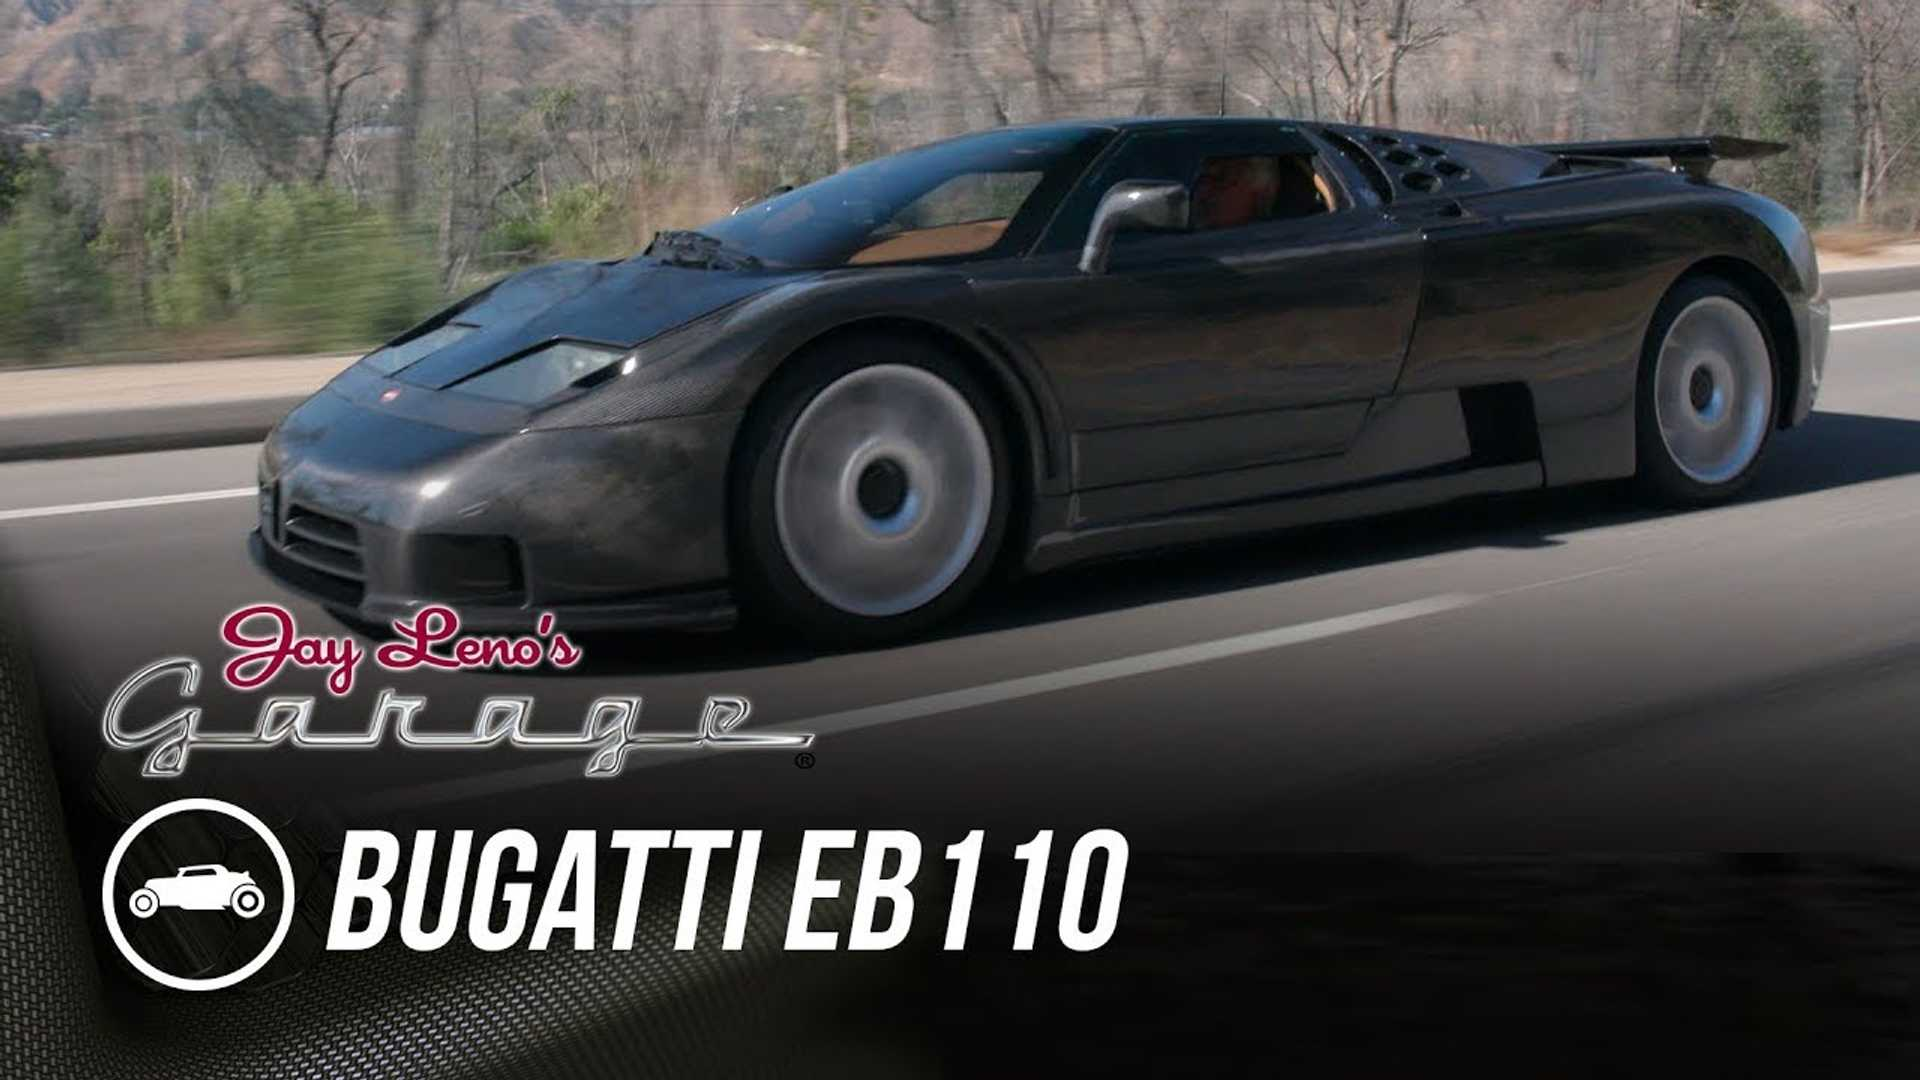 Bugatti EB110 Dauer In Naked Carbon Fiber Visits Jay Leno's Garage